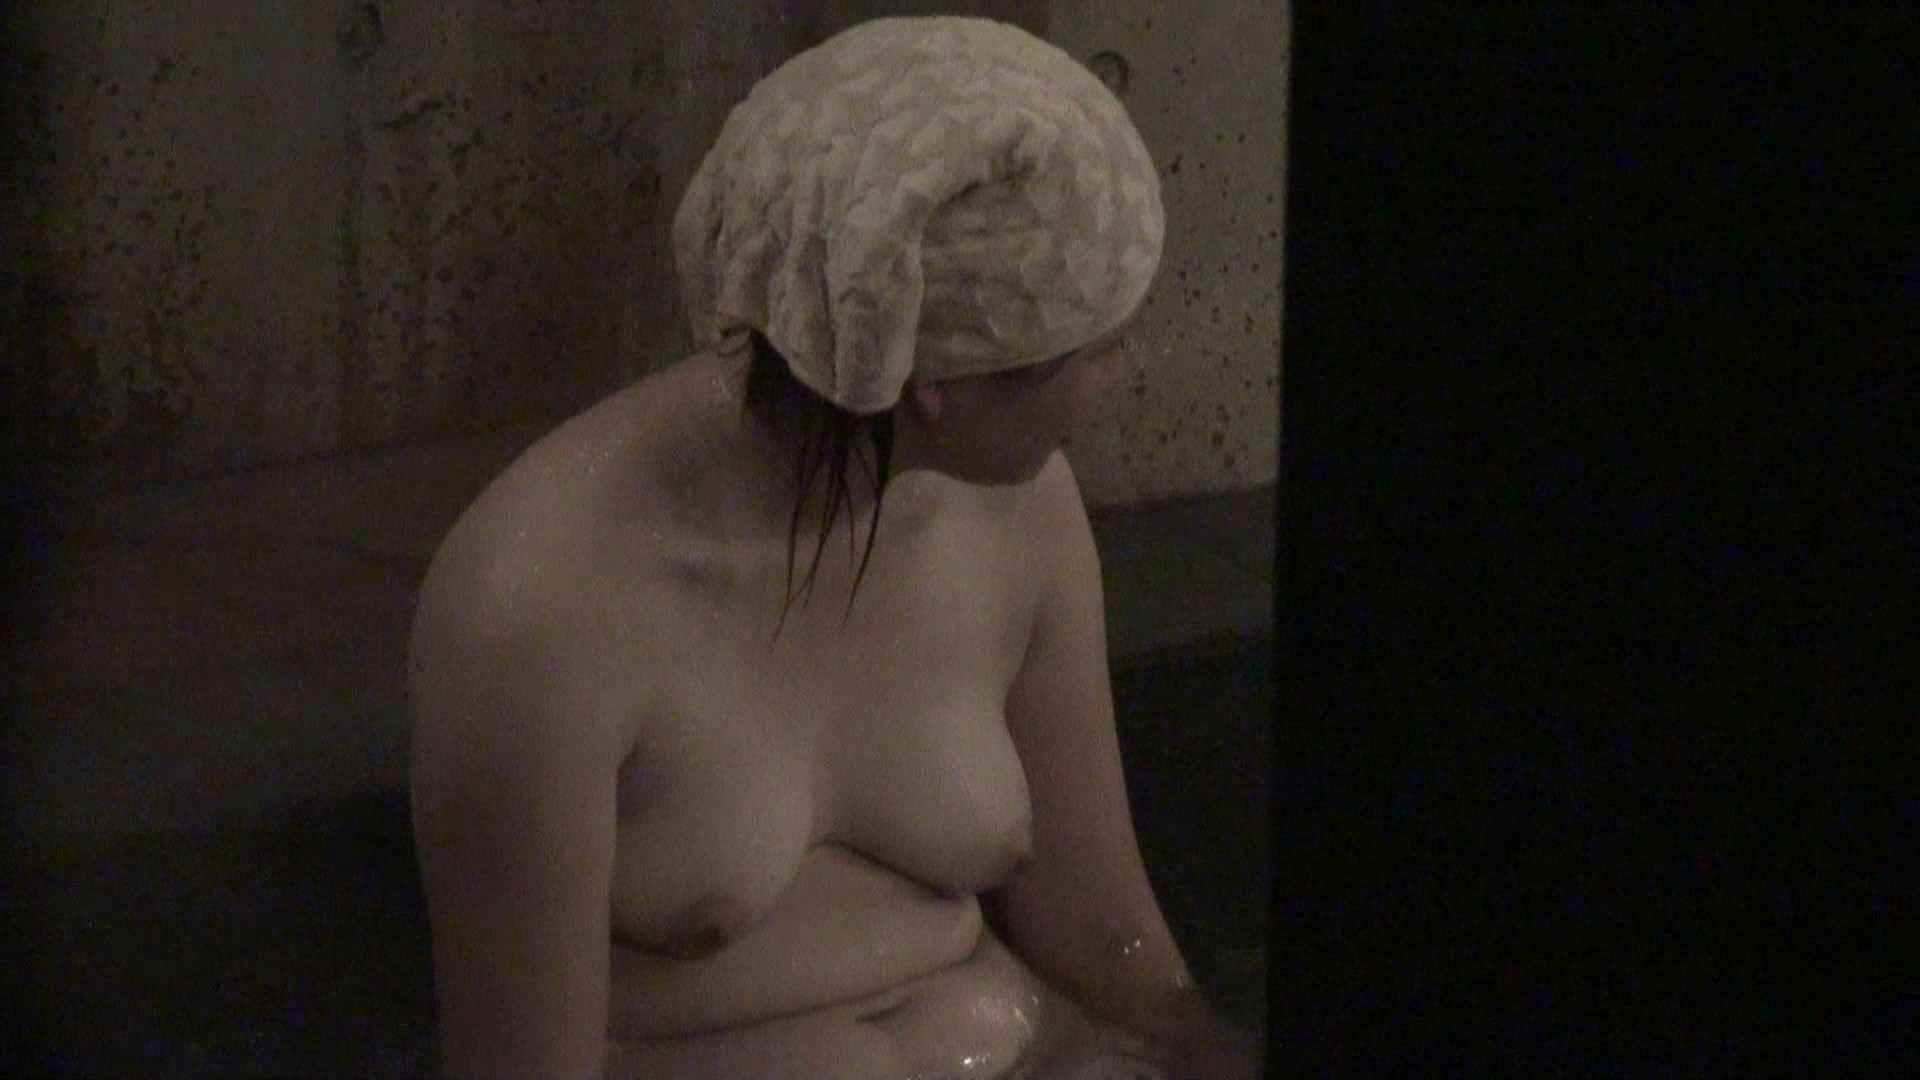 Aquaな露天風呂Vol.320 露天風呂 | OLのエロ生活  30連発 16